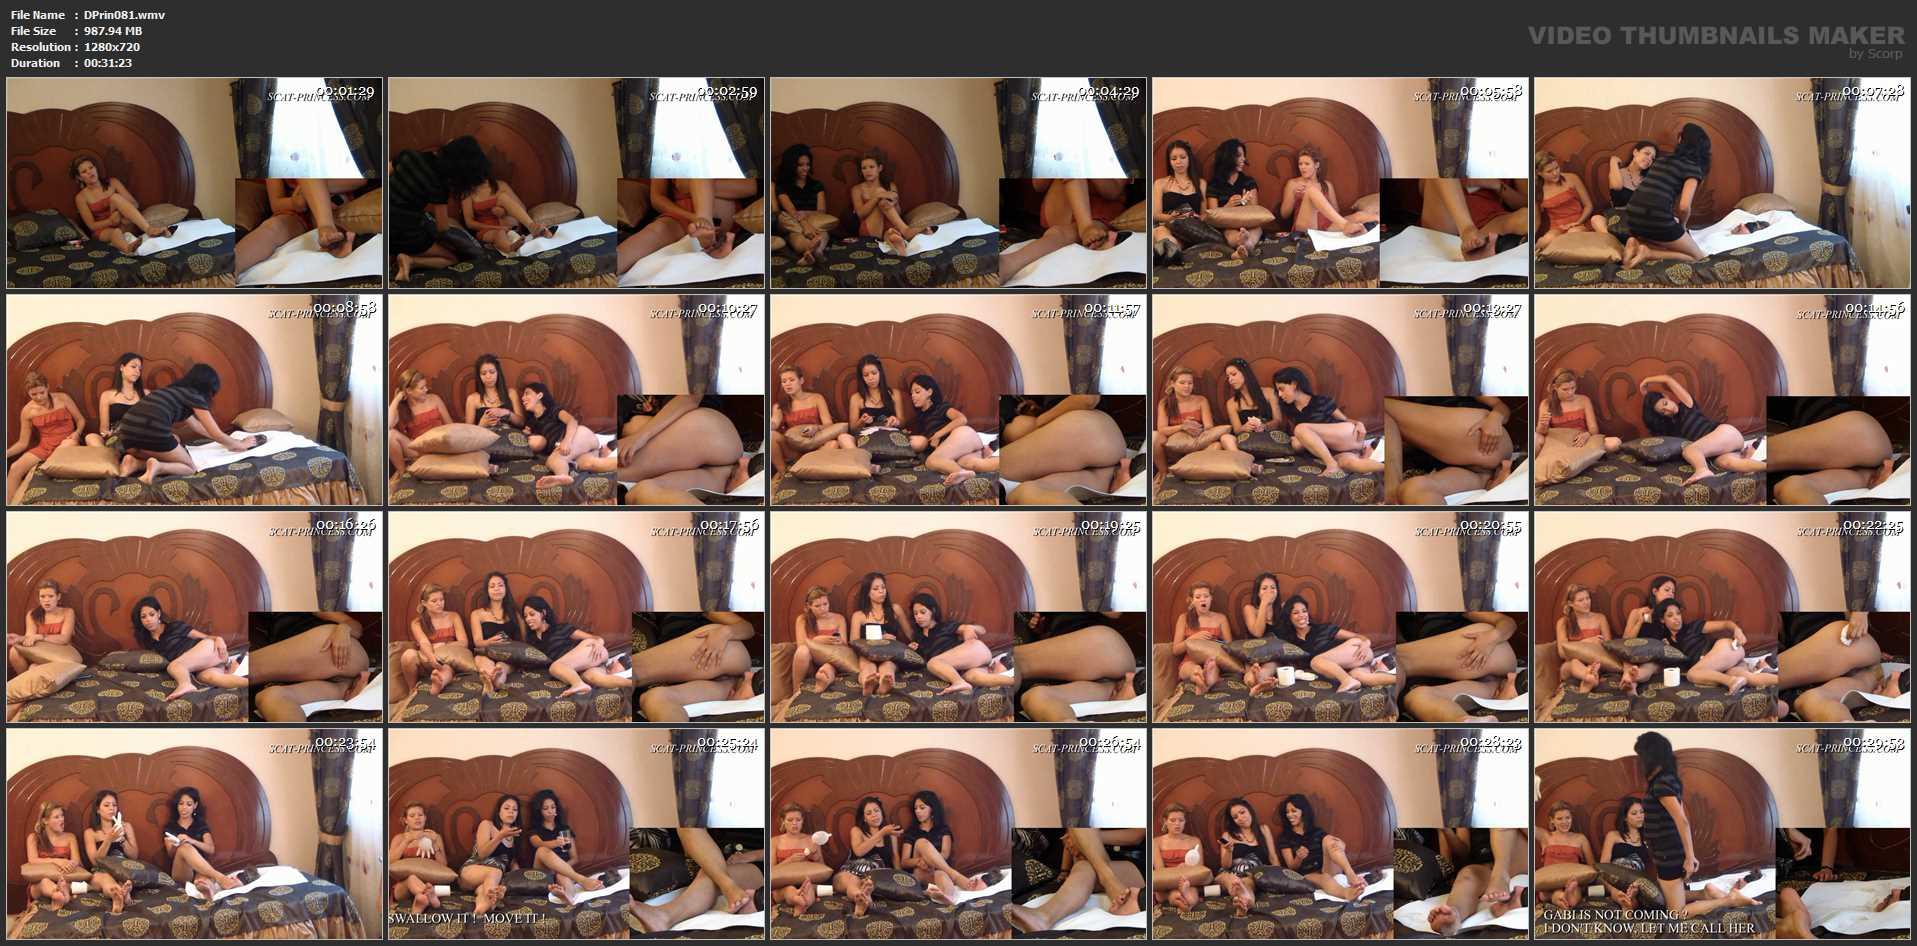 [DOM-PRINCESS] Toilet Slave's Bed Cage Part 1 Diana [HD][720p][WMV]